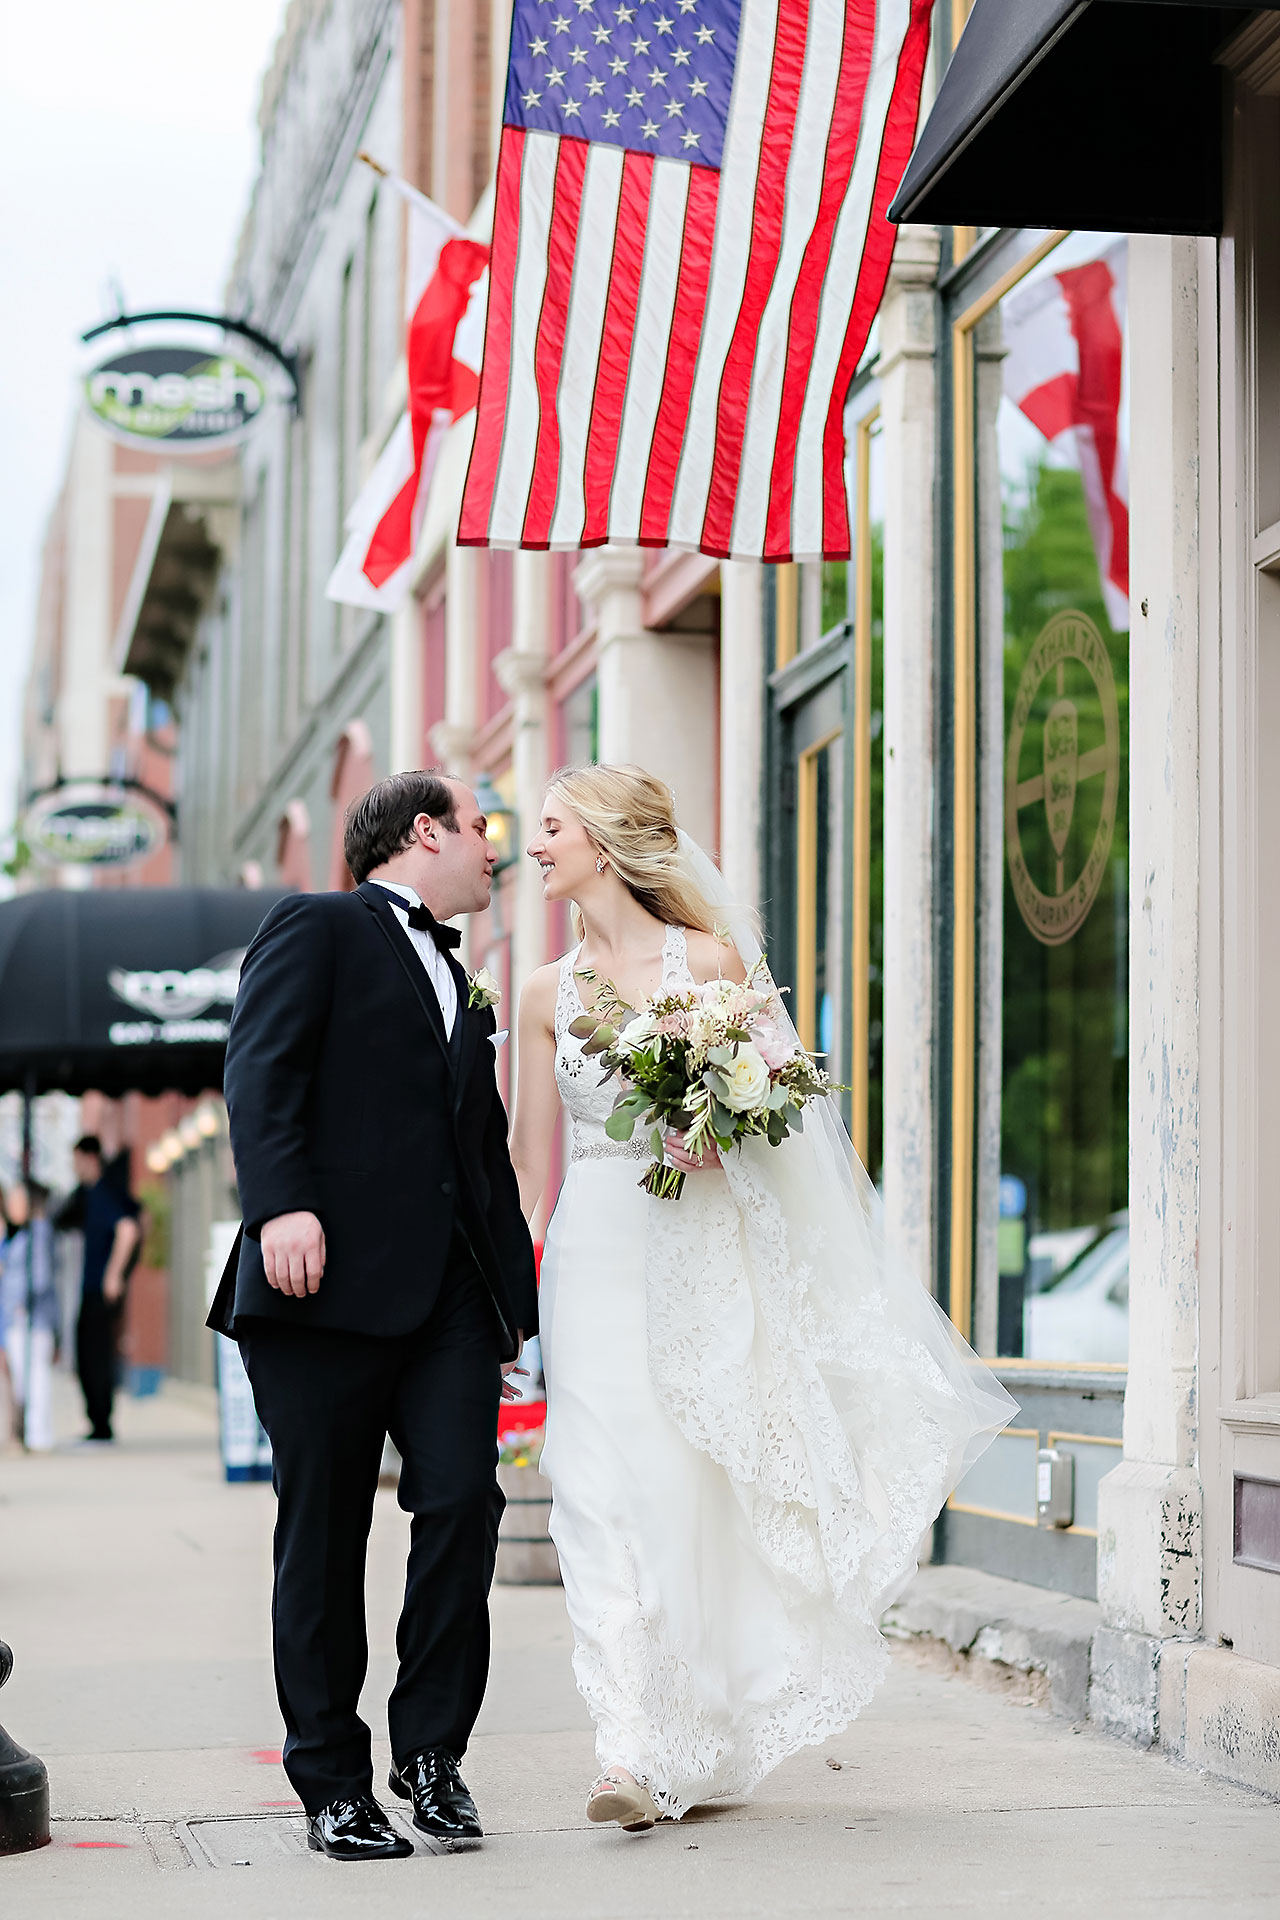 Allison Jeff Union Station Crowne Plaza Indianapolis wedding 161